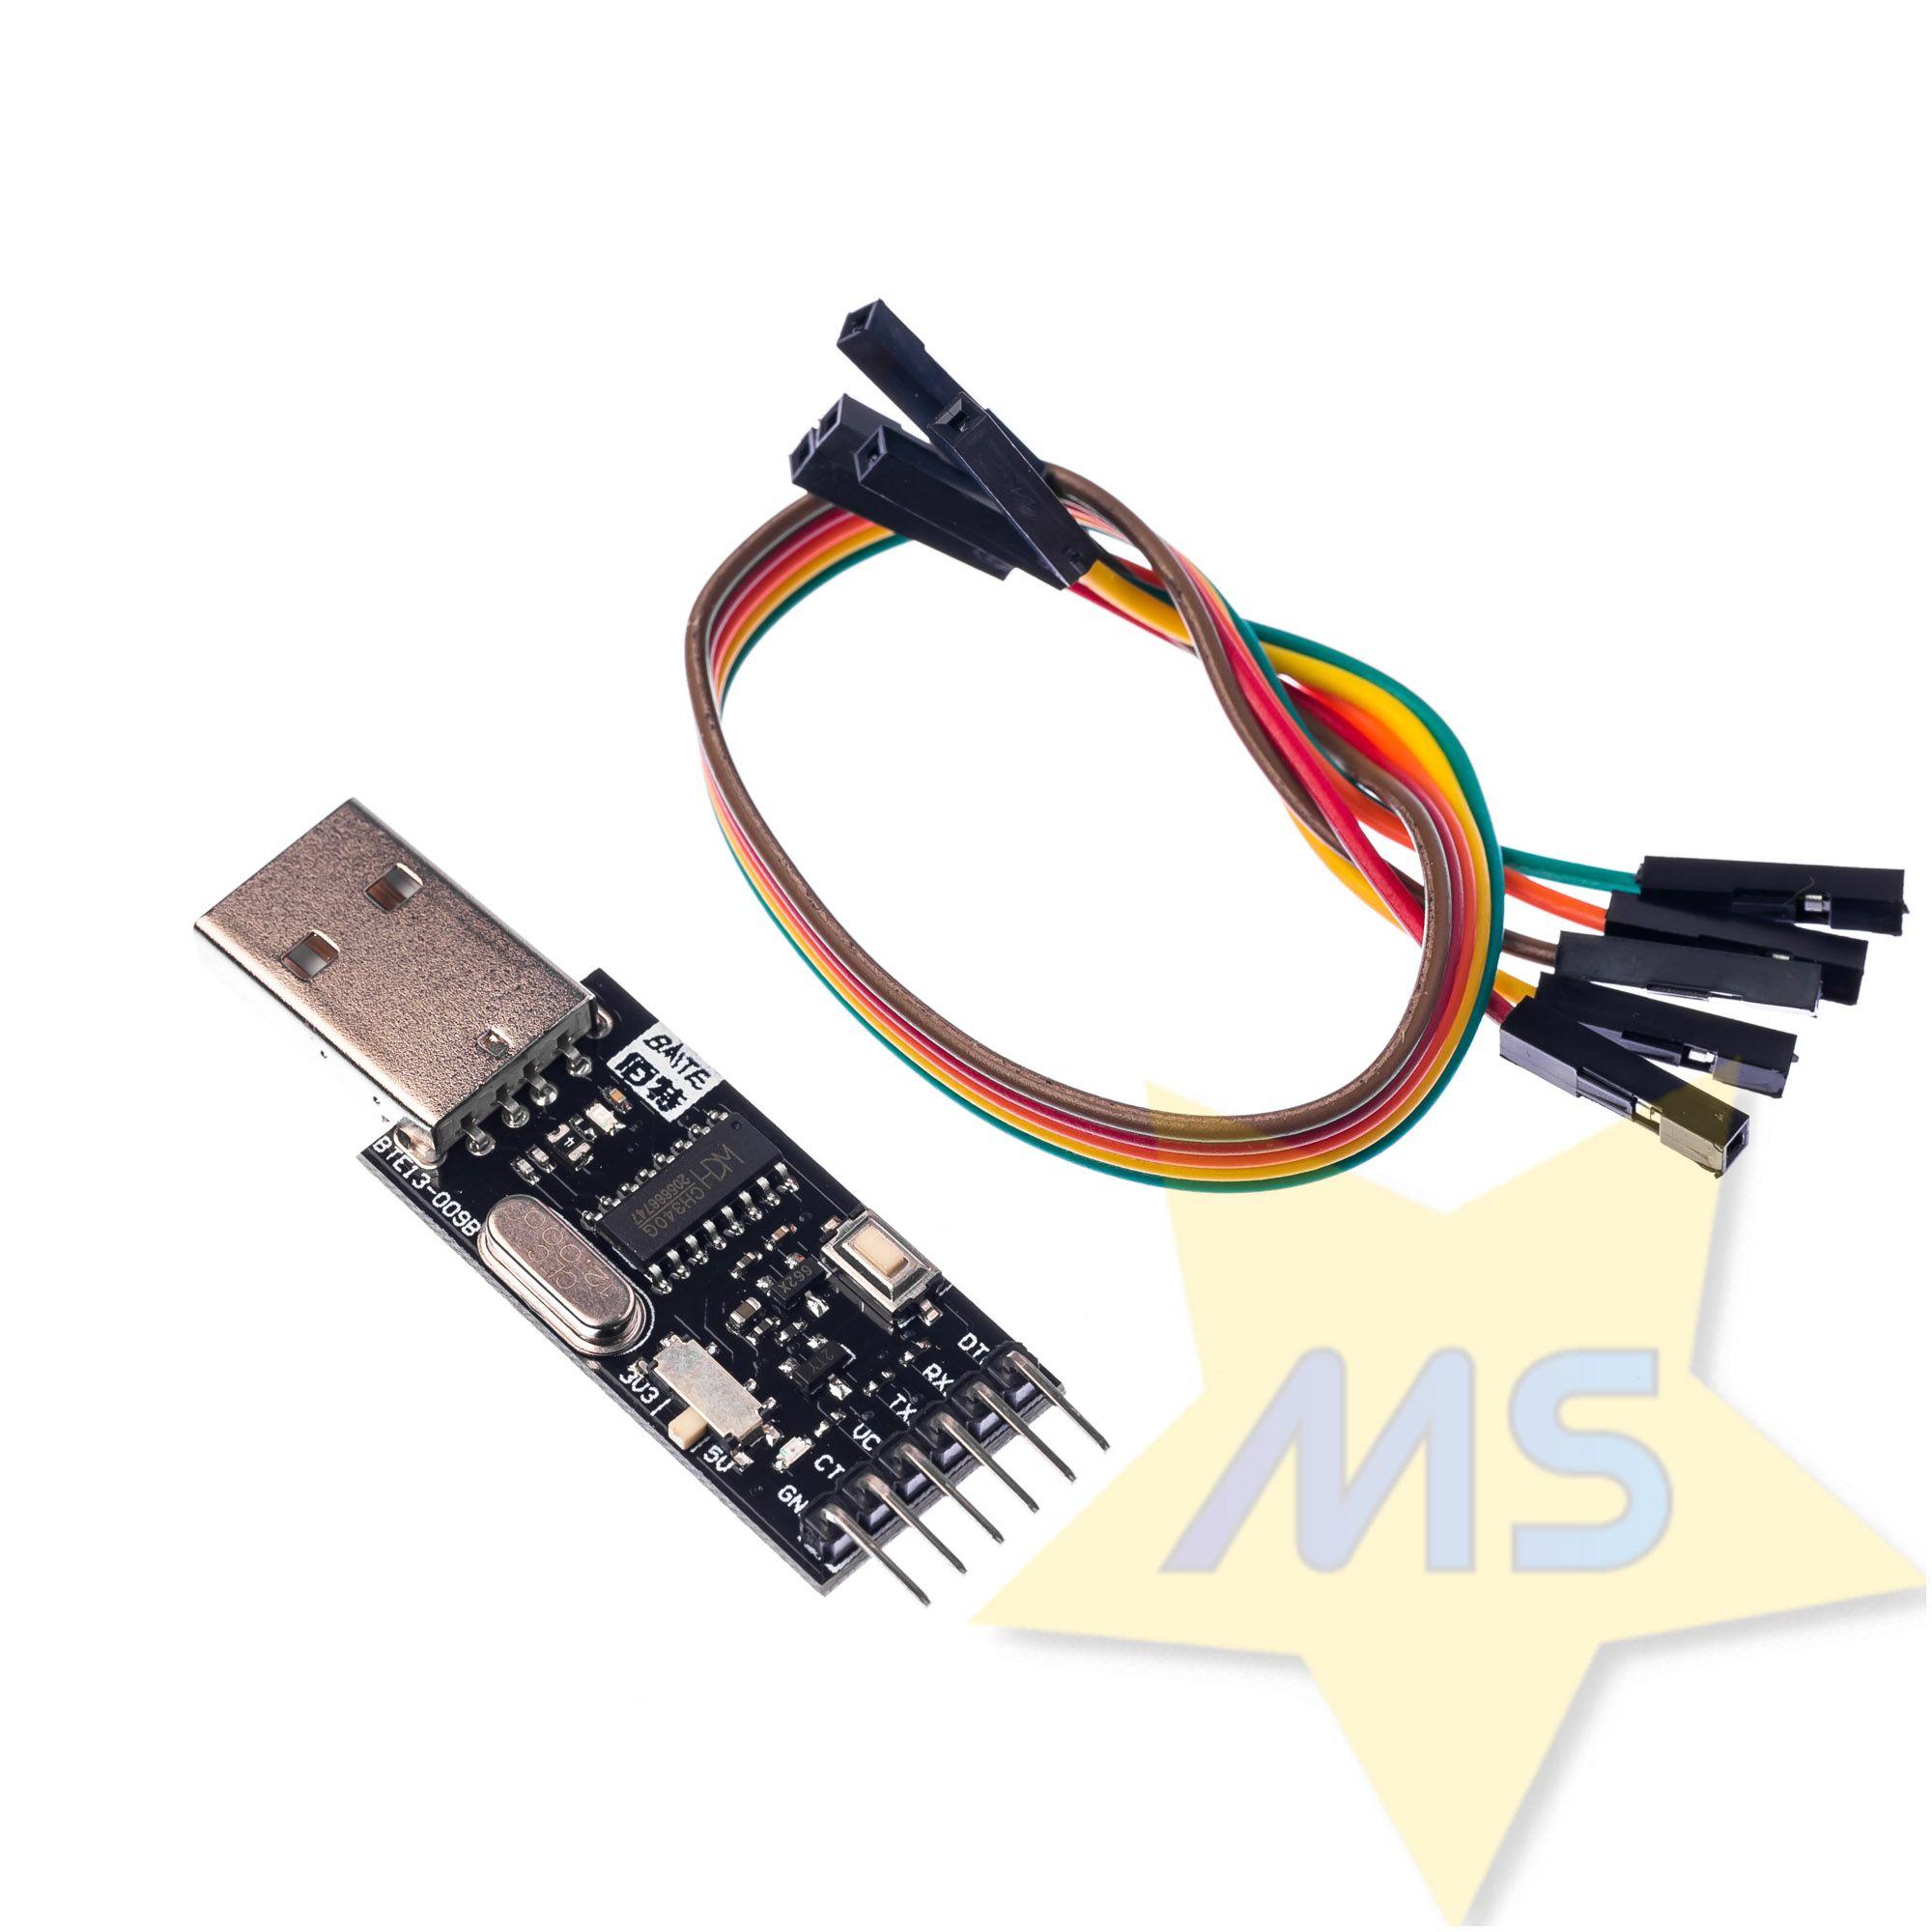 Conversor FTDI  CH340G USB serial